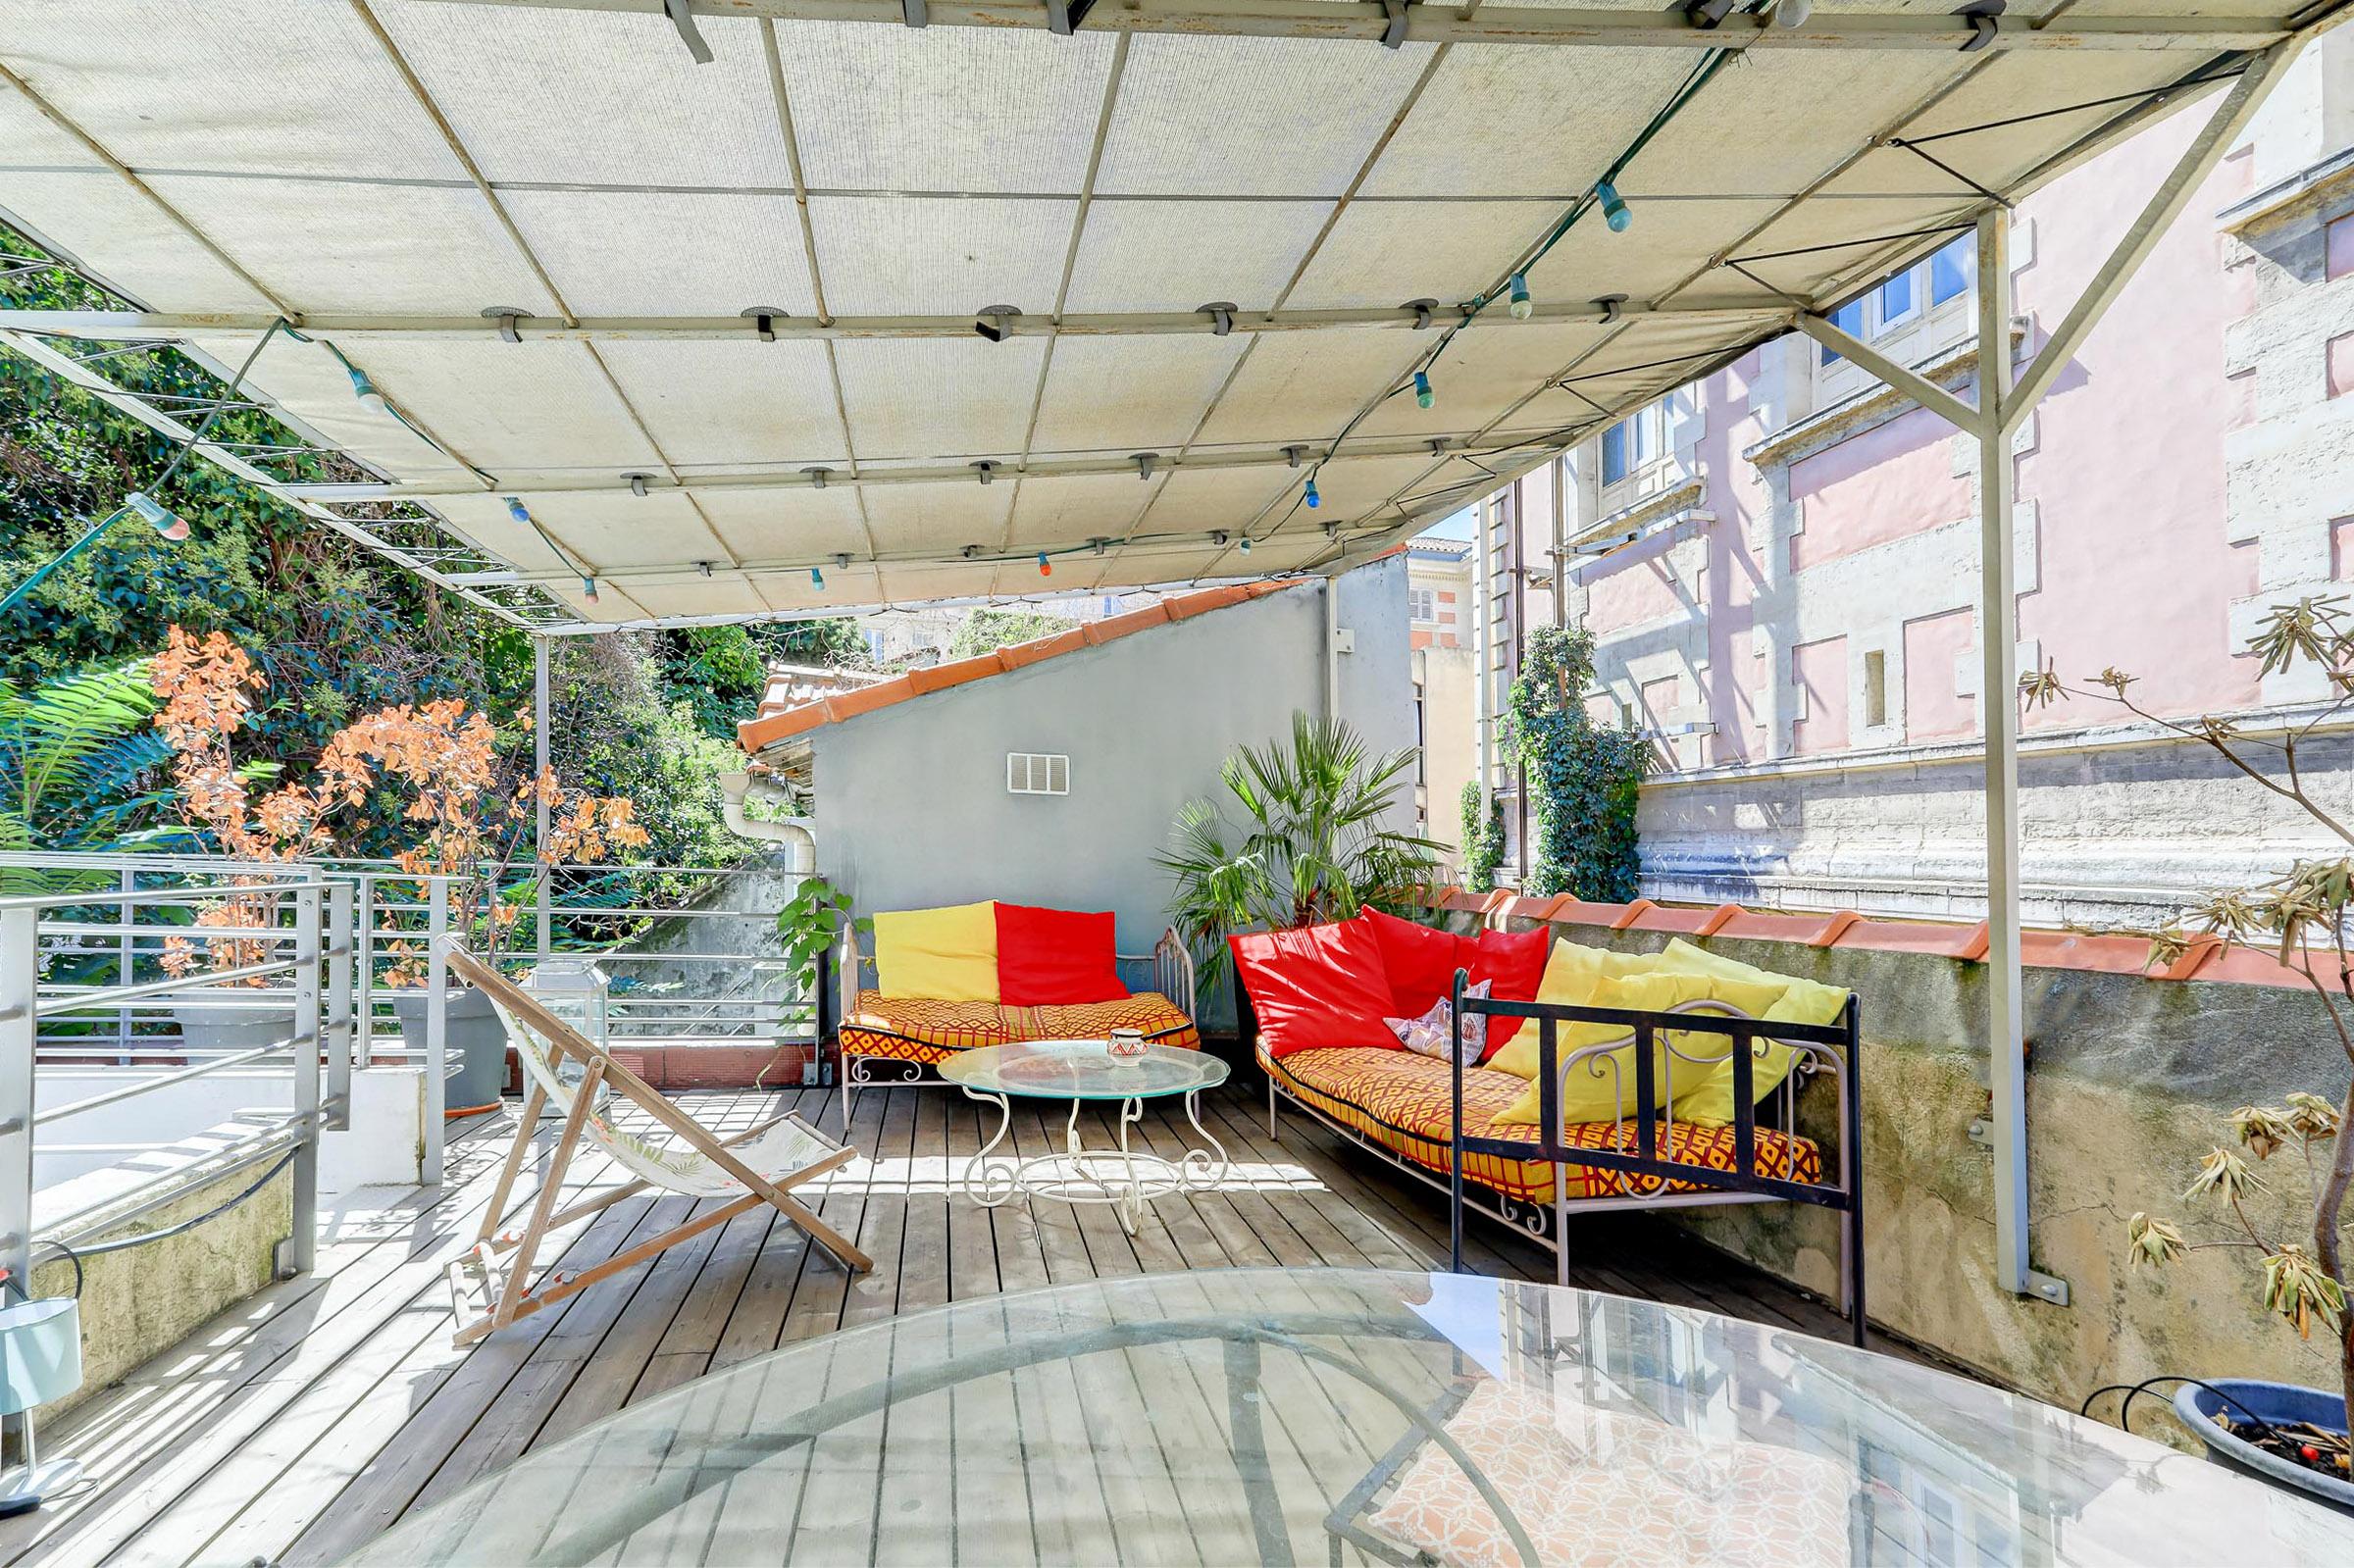 Une Terrasse Hyper centre Hyper calme